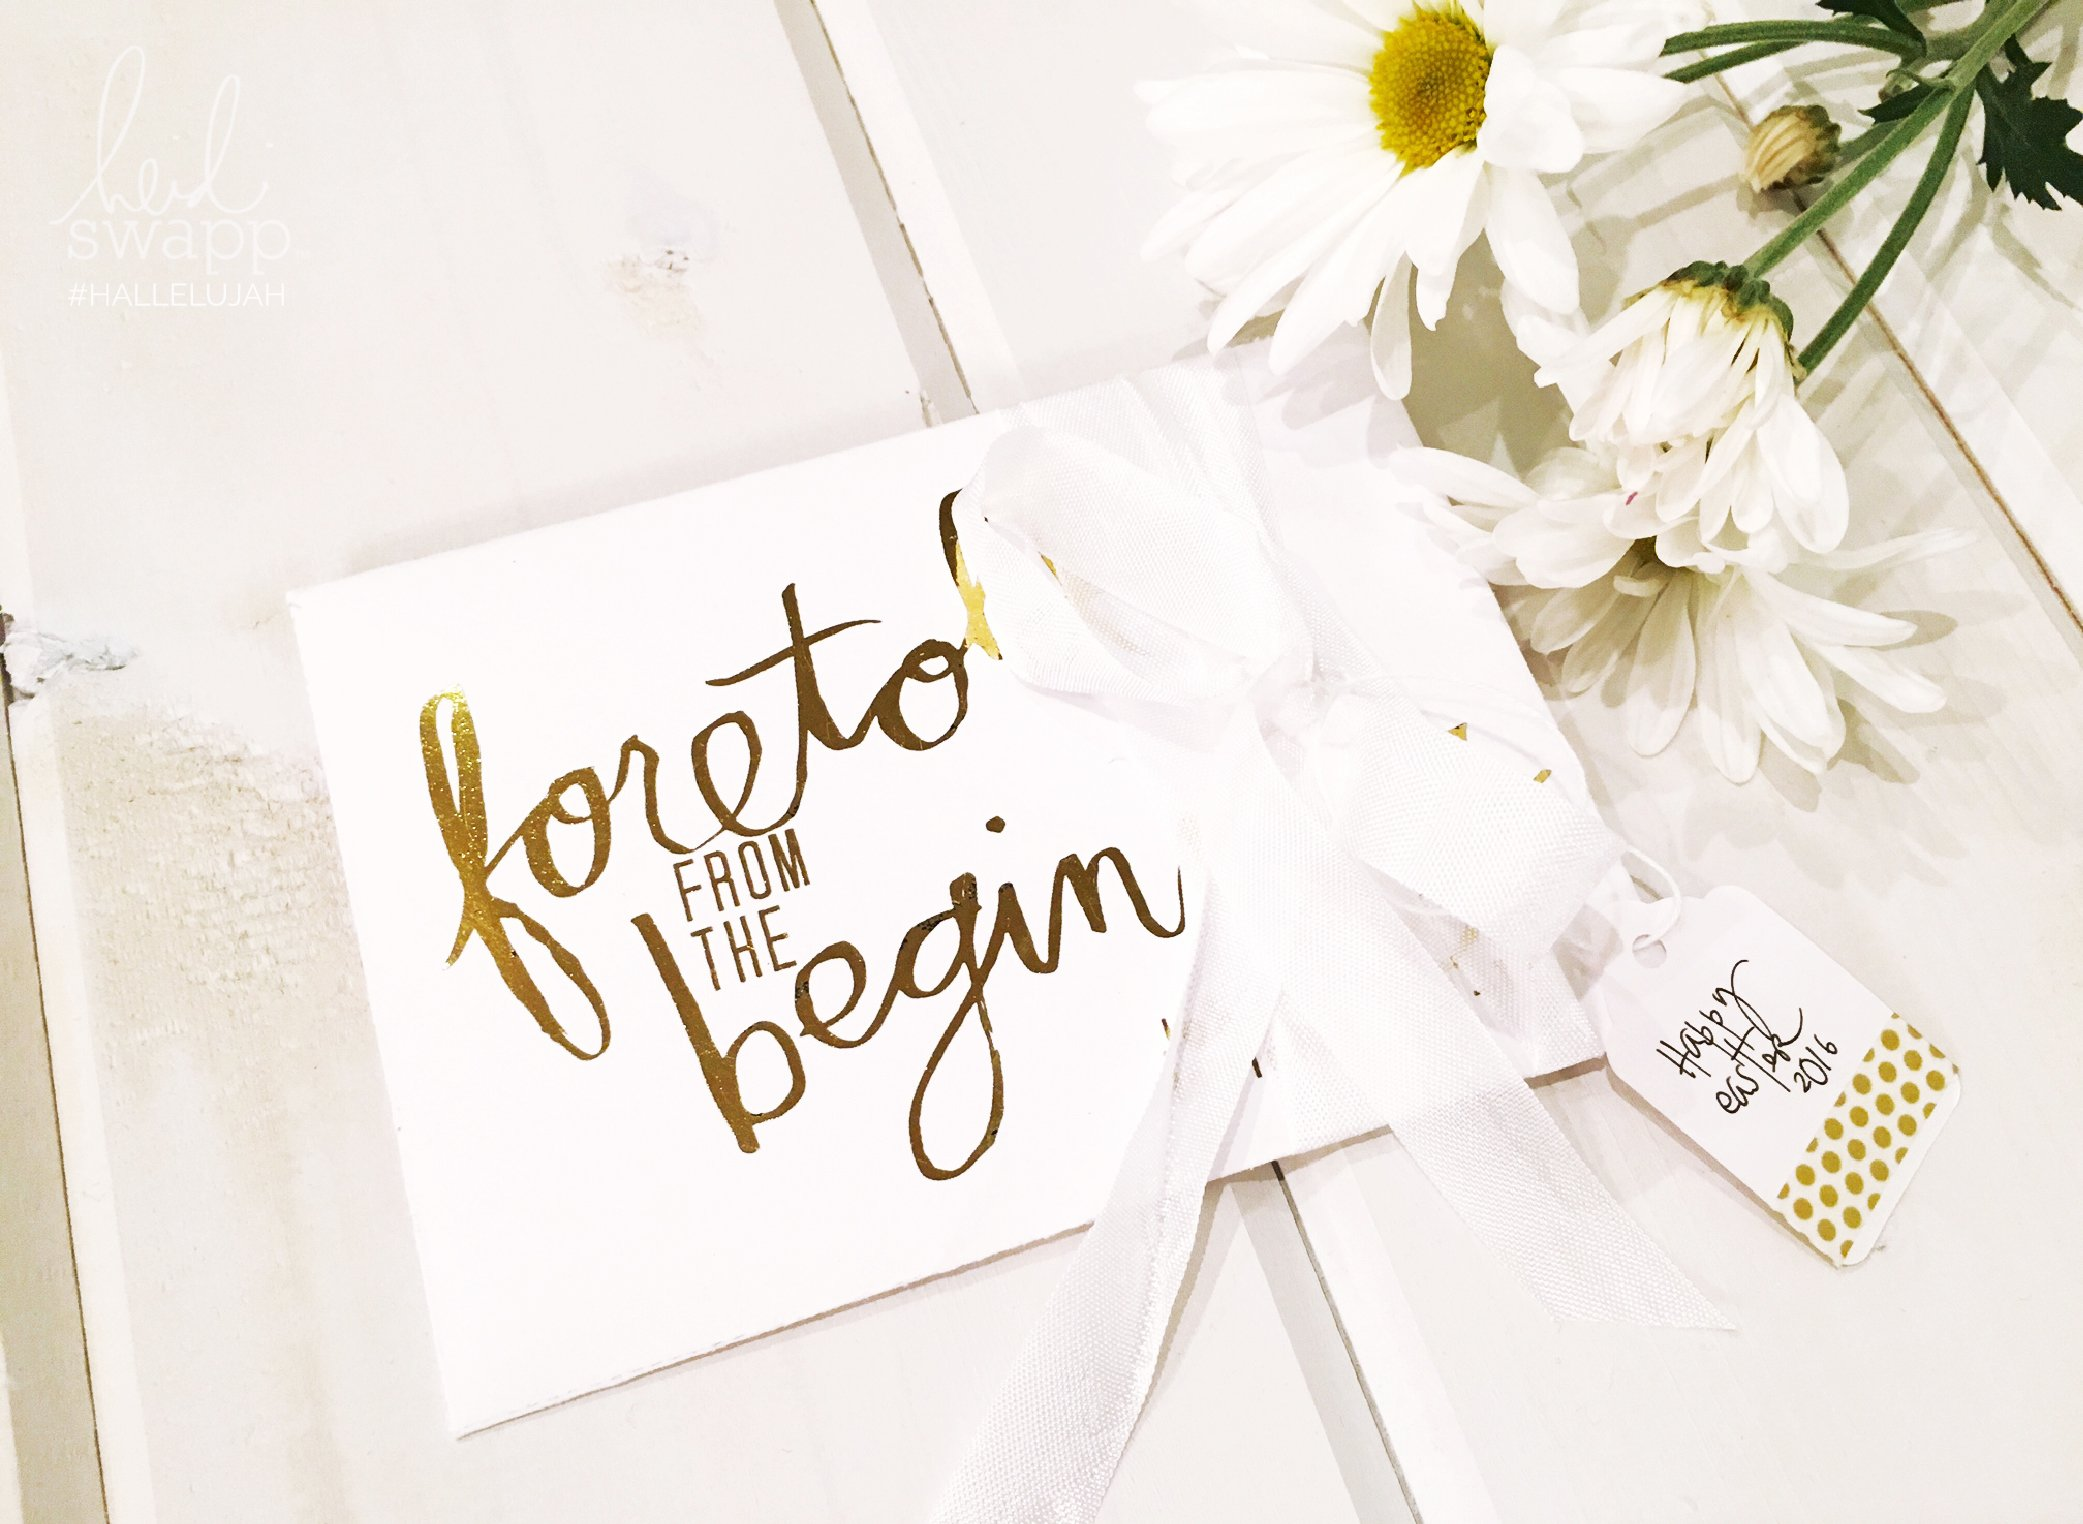 Free Printable Nesting Envelopes that tell the Easter Story #HeidiSwapp #Hallelujah